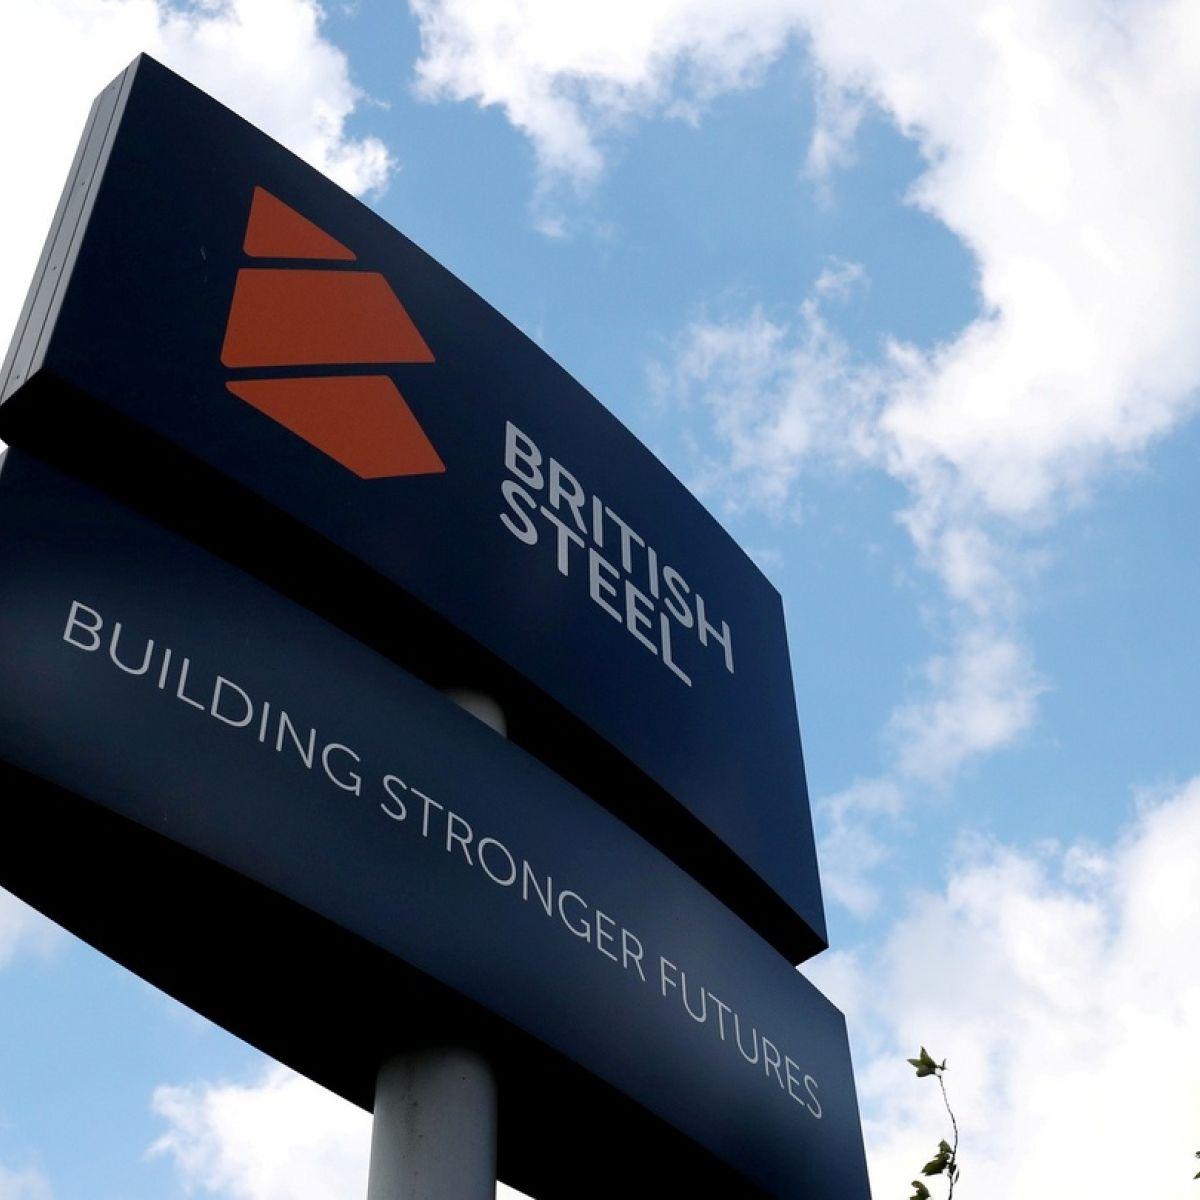 British Steel forced into liquidation